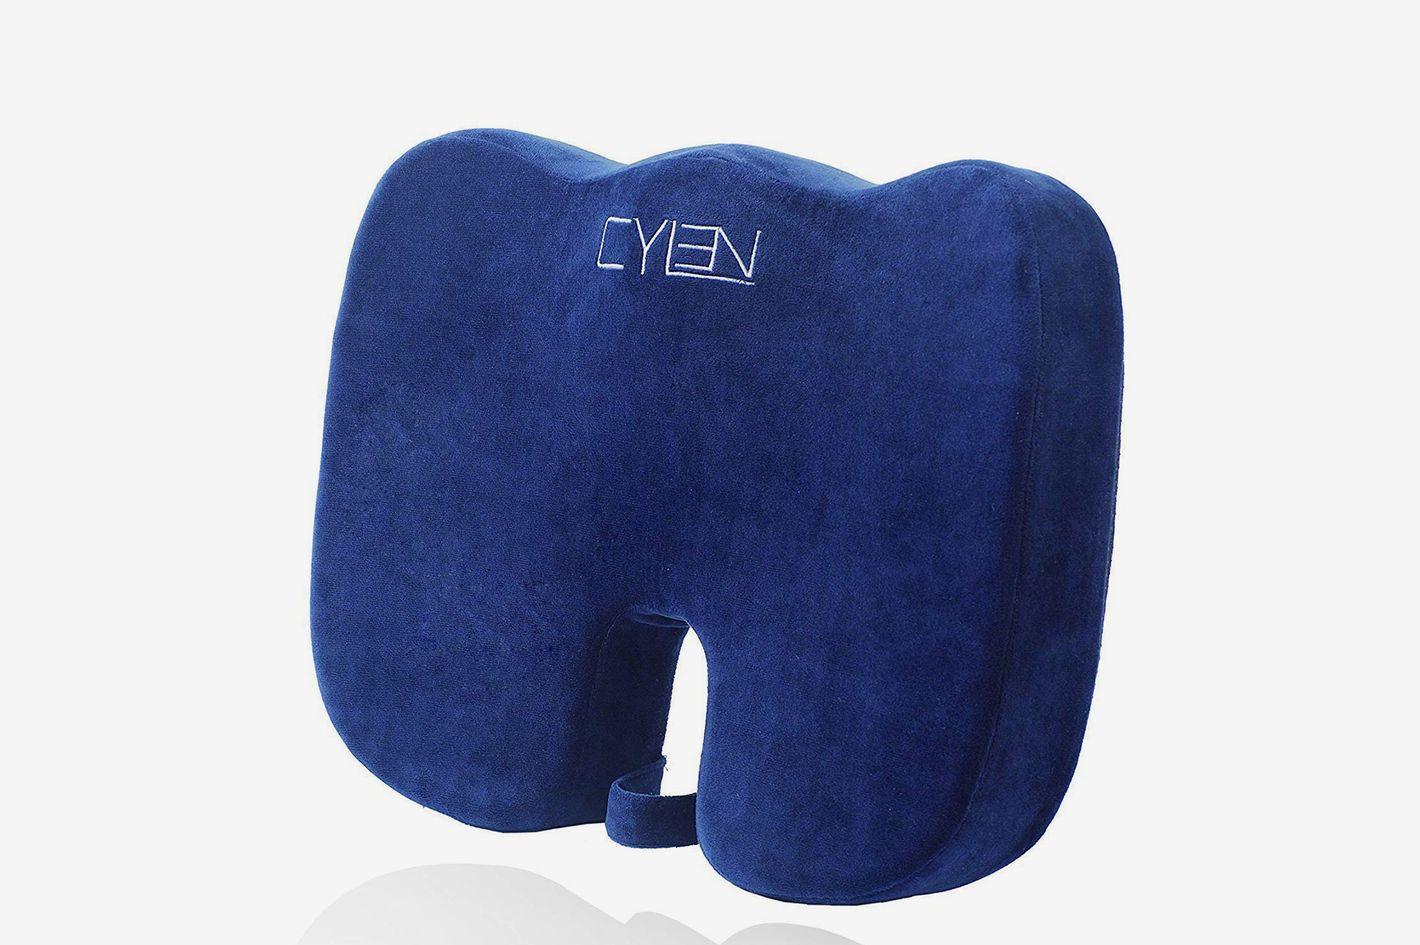 CYLEN -Memory Foam Bamboo Charcoal Infused Ventilated Orthopedic Seat Cushion